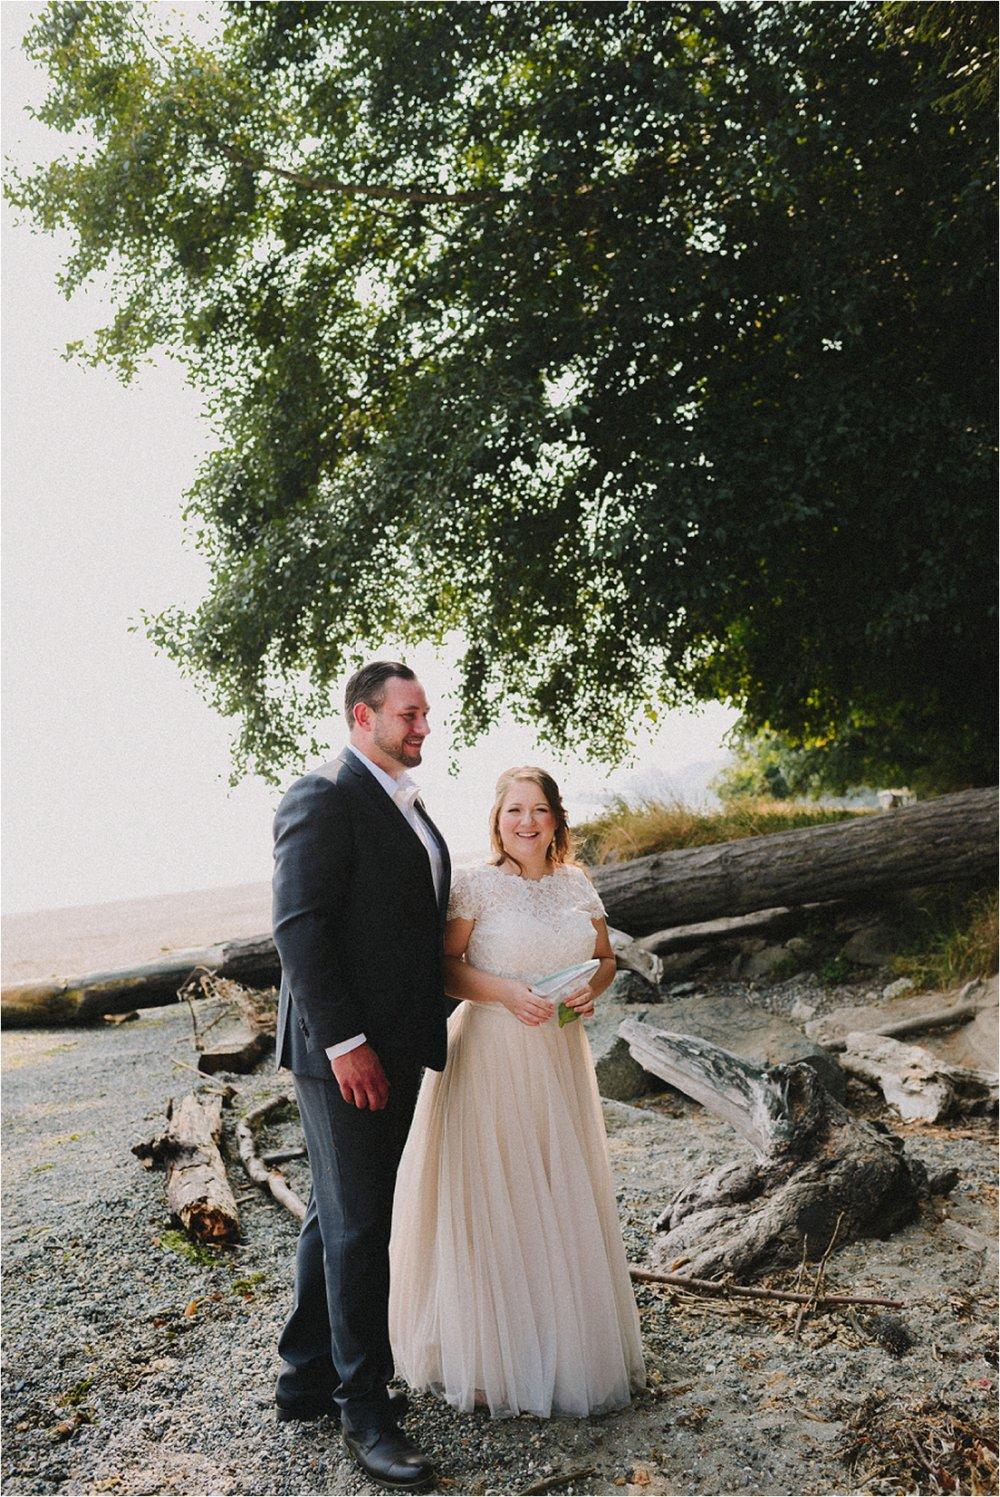 owen-beach-priest-point-park-tacoma-washington-elopement-jannicka-mayte-anchorage-alaska-wedding-elopement-photographer (50).jpg